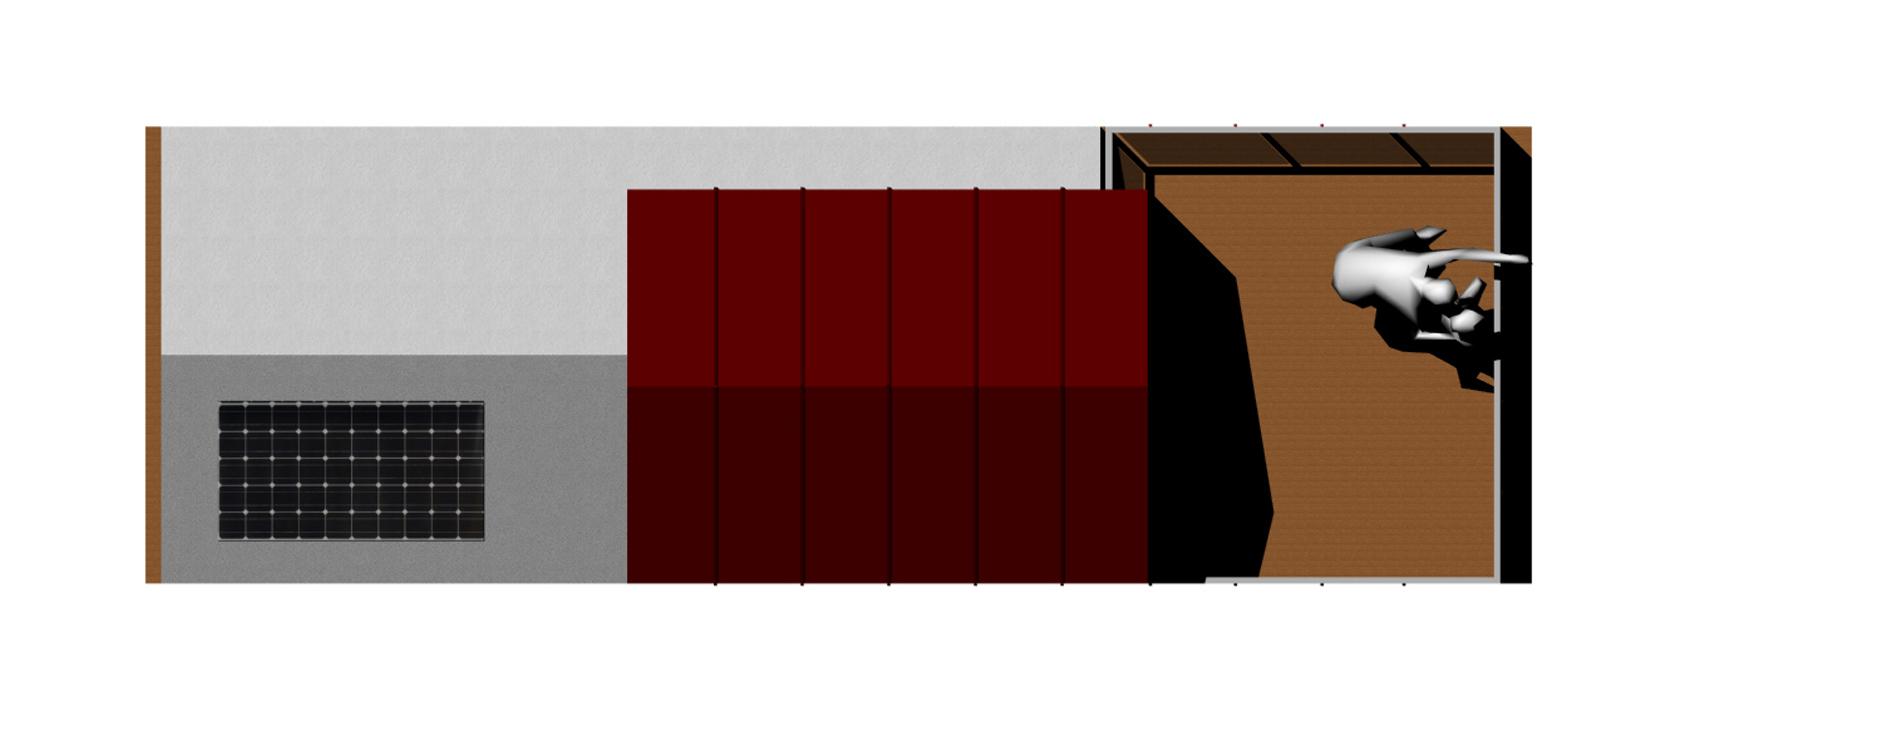 Junhome-maison-flottante-Architecture-navale-Vincent-Lebailly-Boat-design